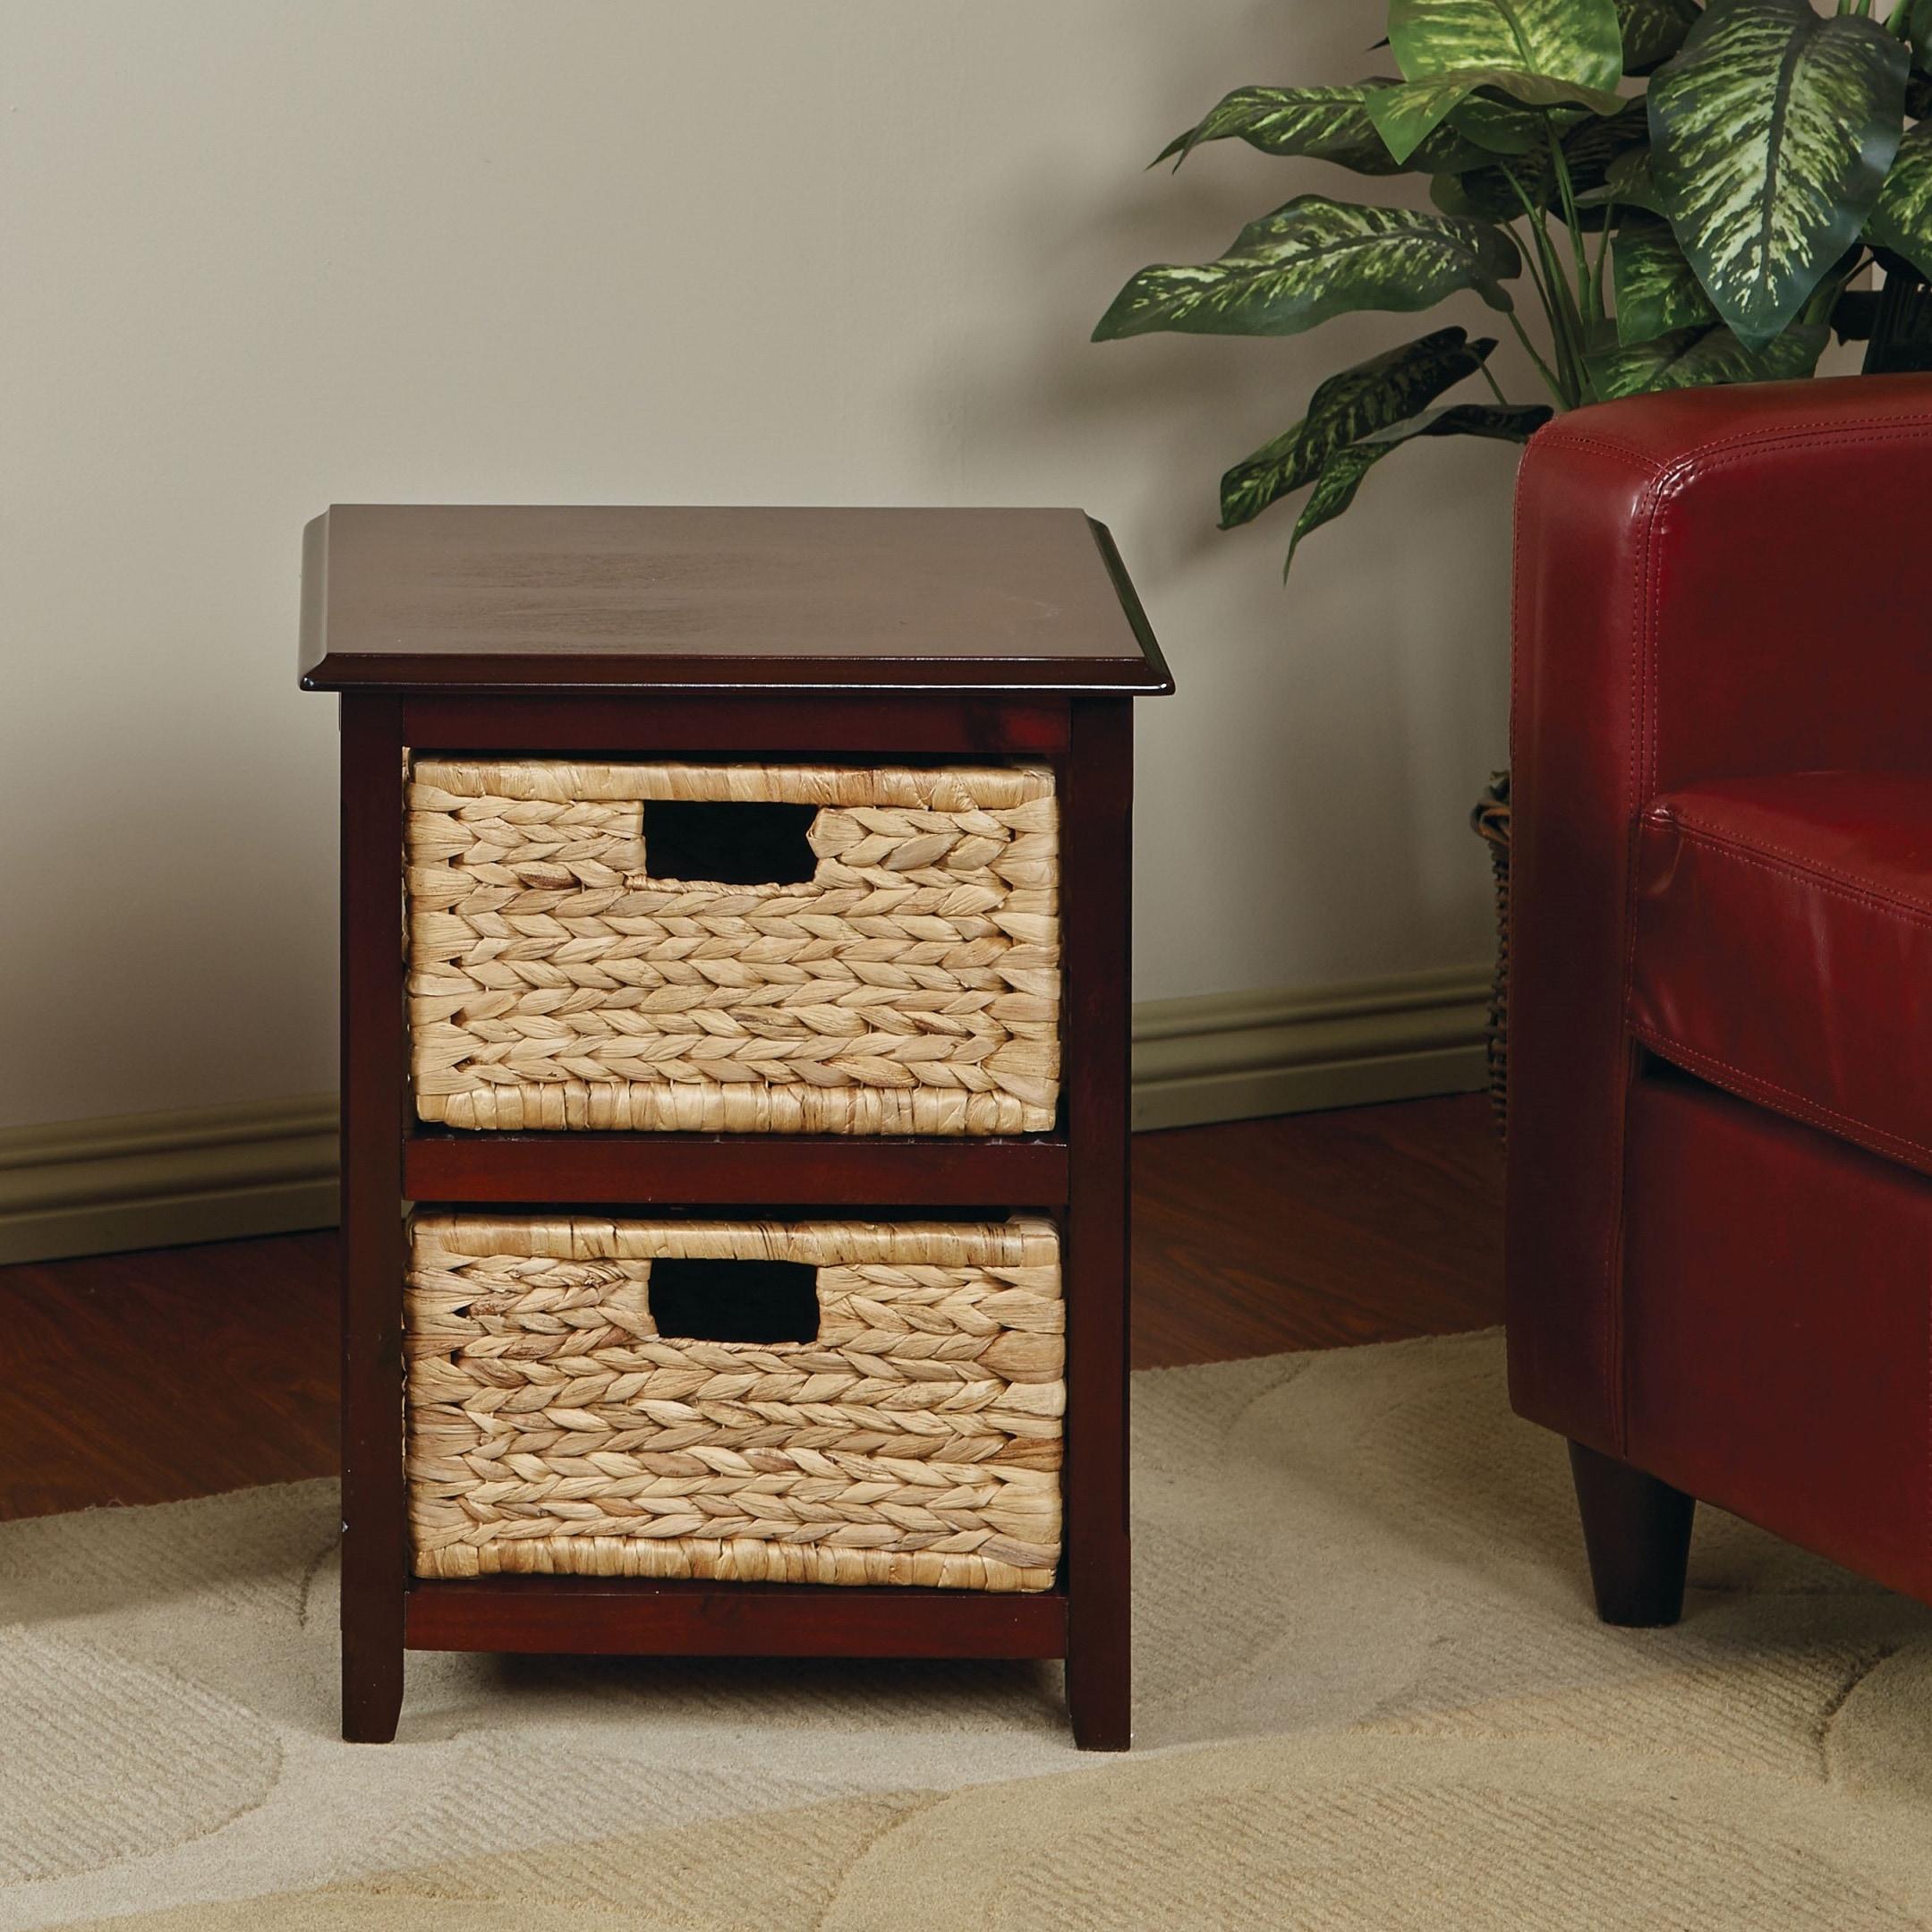 wicker nightstand side end table bedside 2 drawer wood accent furniture espresso ebay. Black Bedroom Furniture Sets. Home Design Ideas